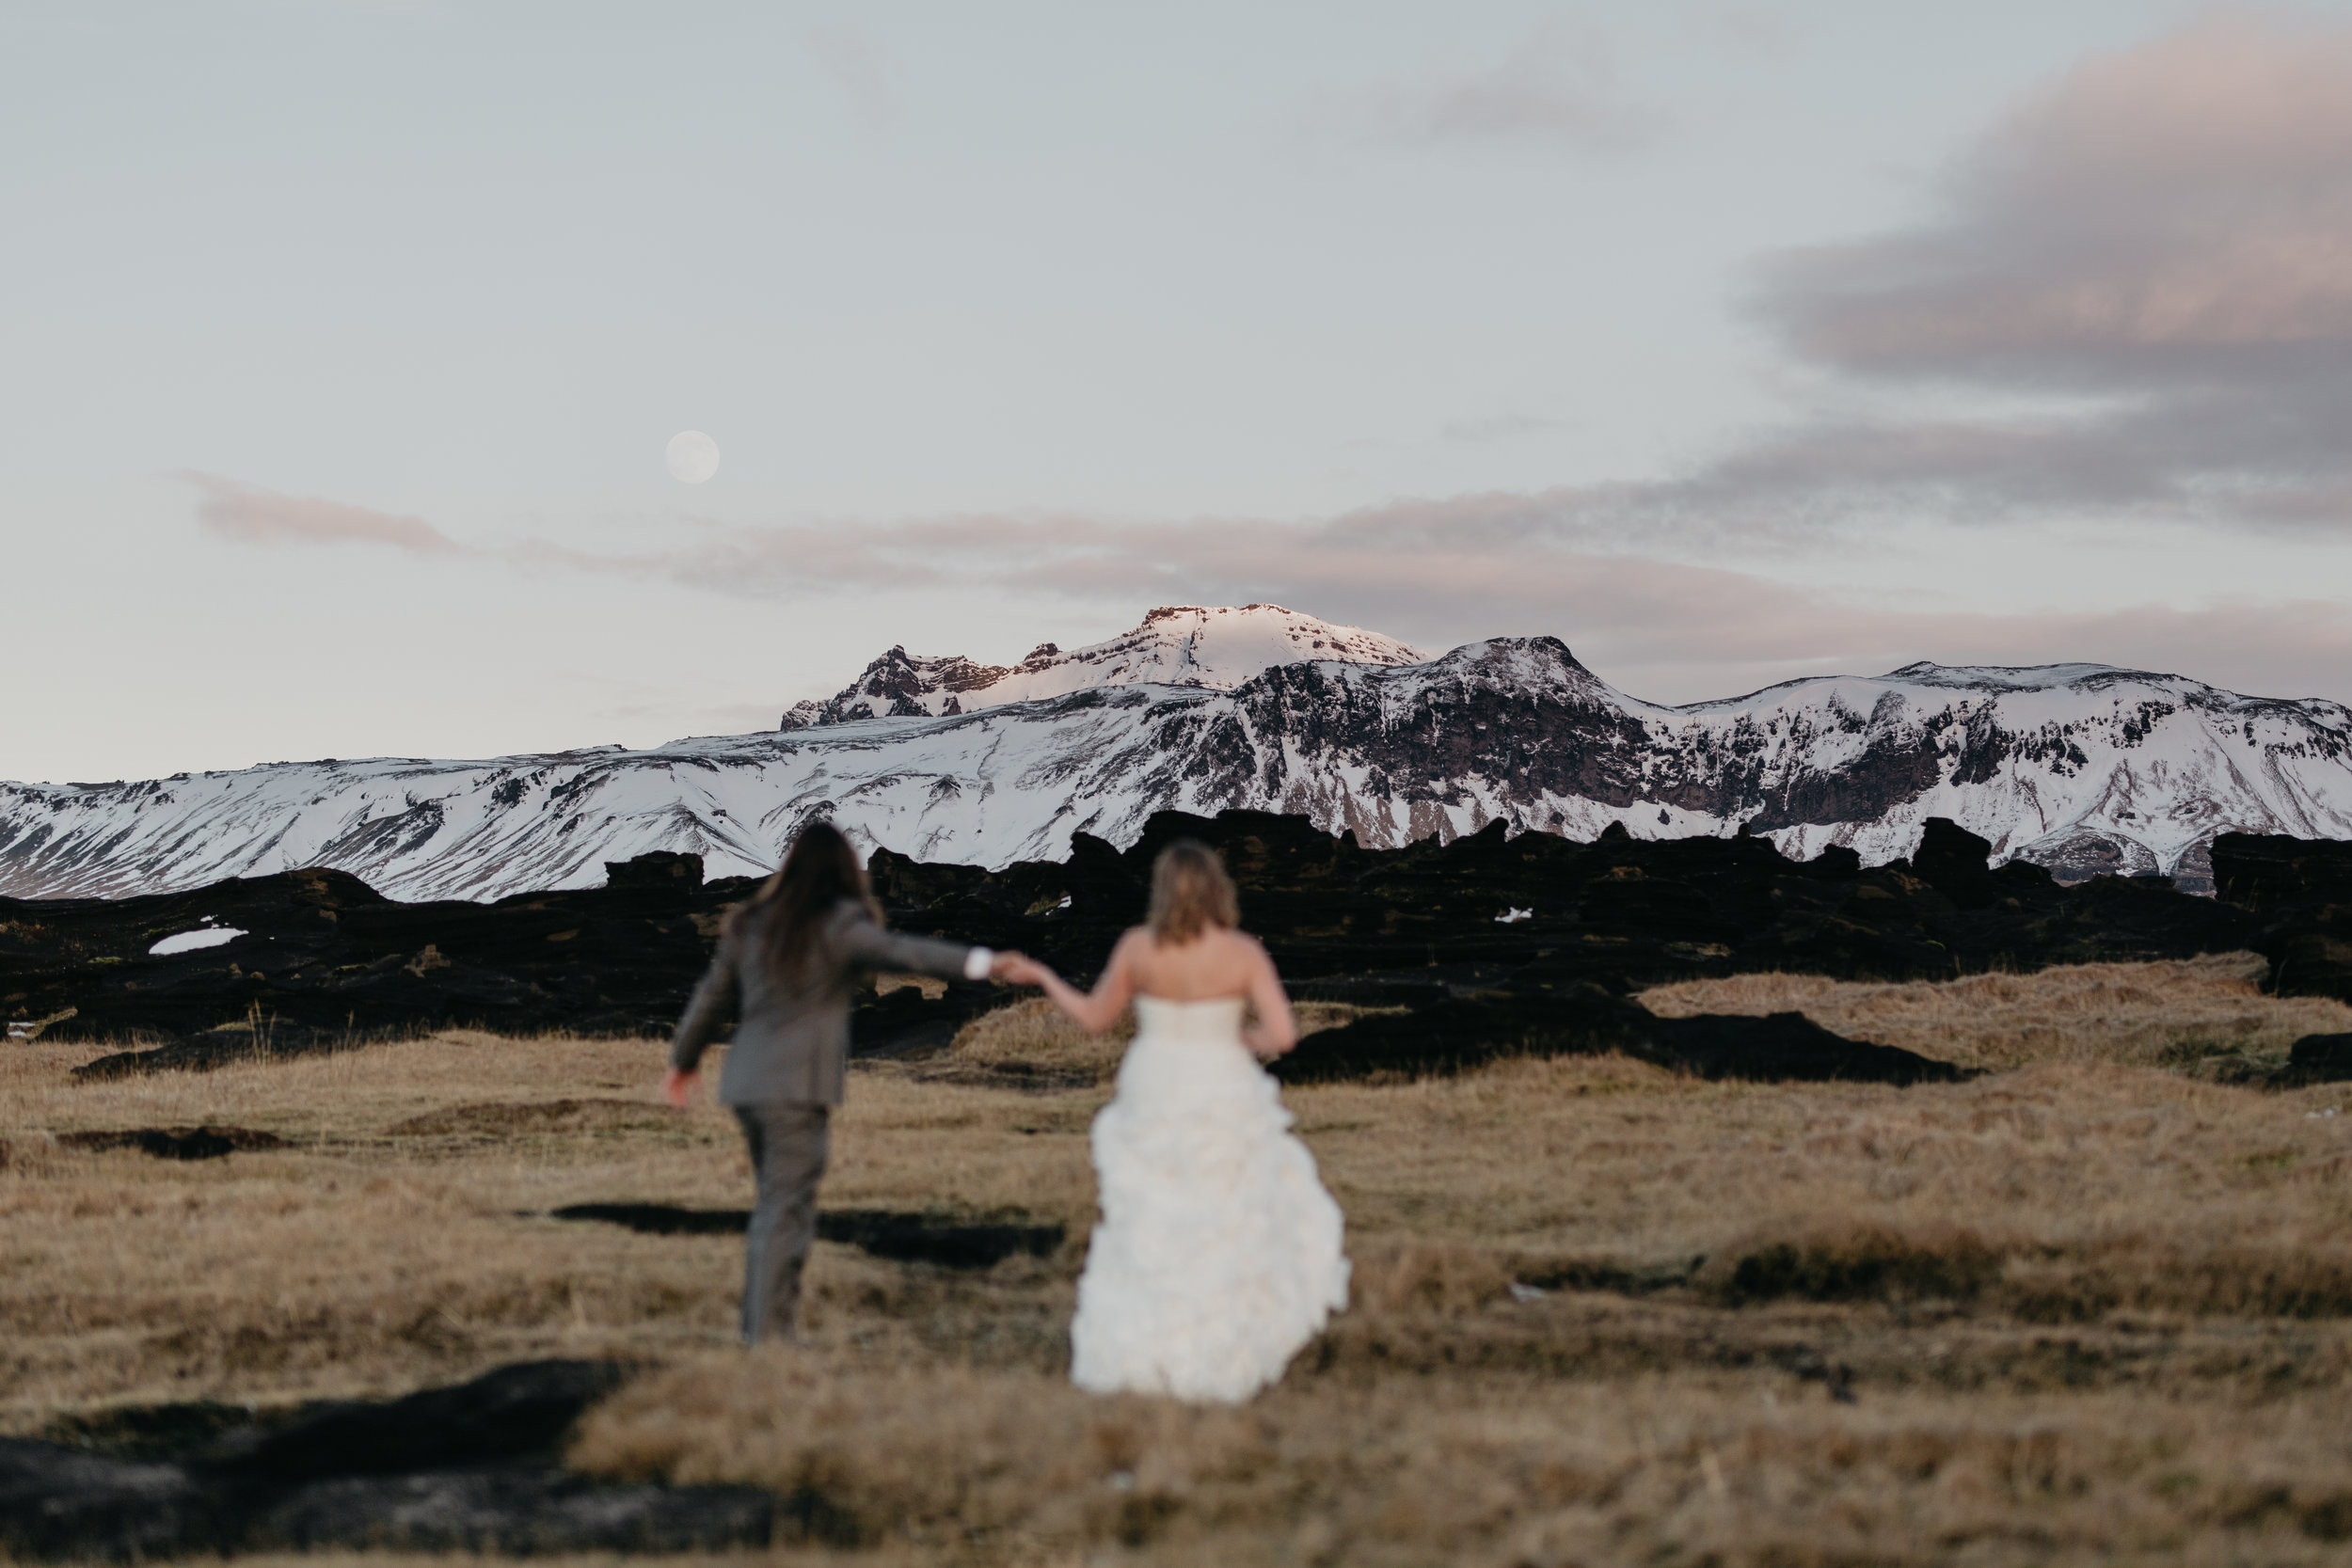 nicole-daacke-photography-iceland-winter-sunset-adventure-elopement-skogafoss-waterfall-black-sand-beach-dyrholaey-vik-iceland-intimate-wedding-black-church-elopement-photographer-23.jpg